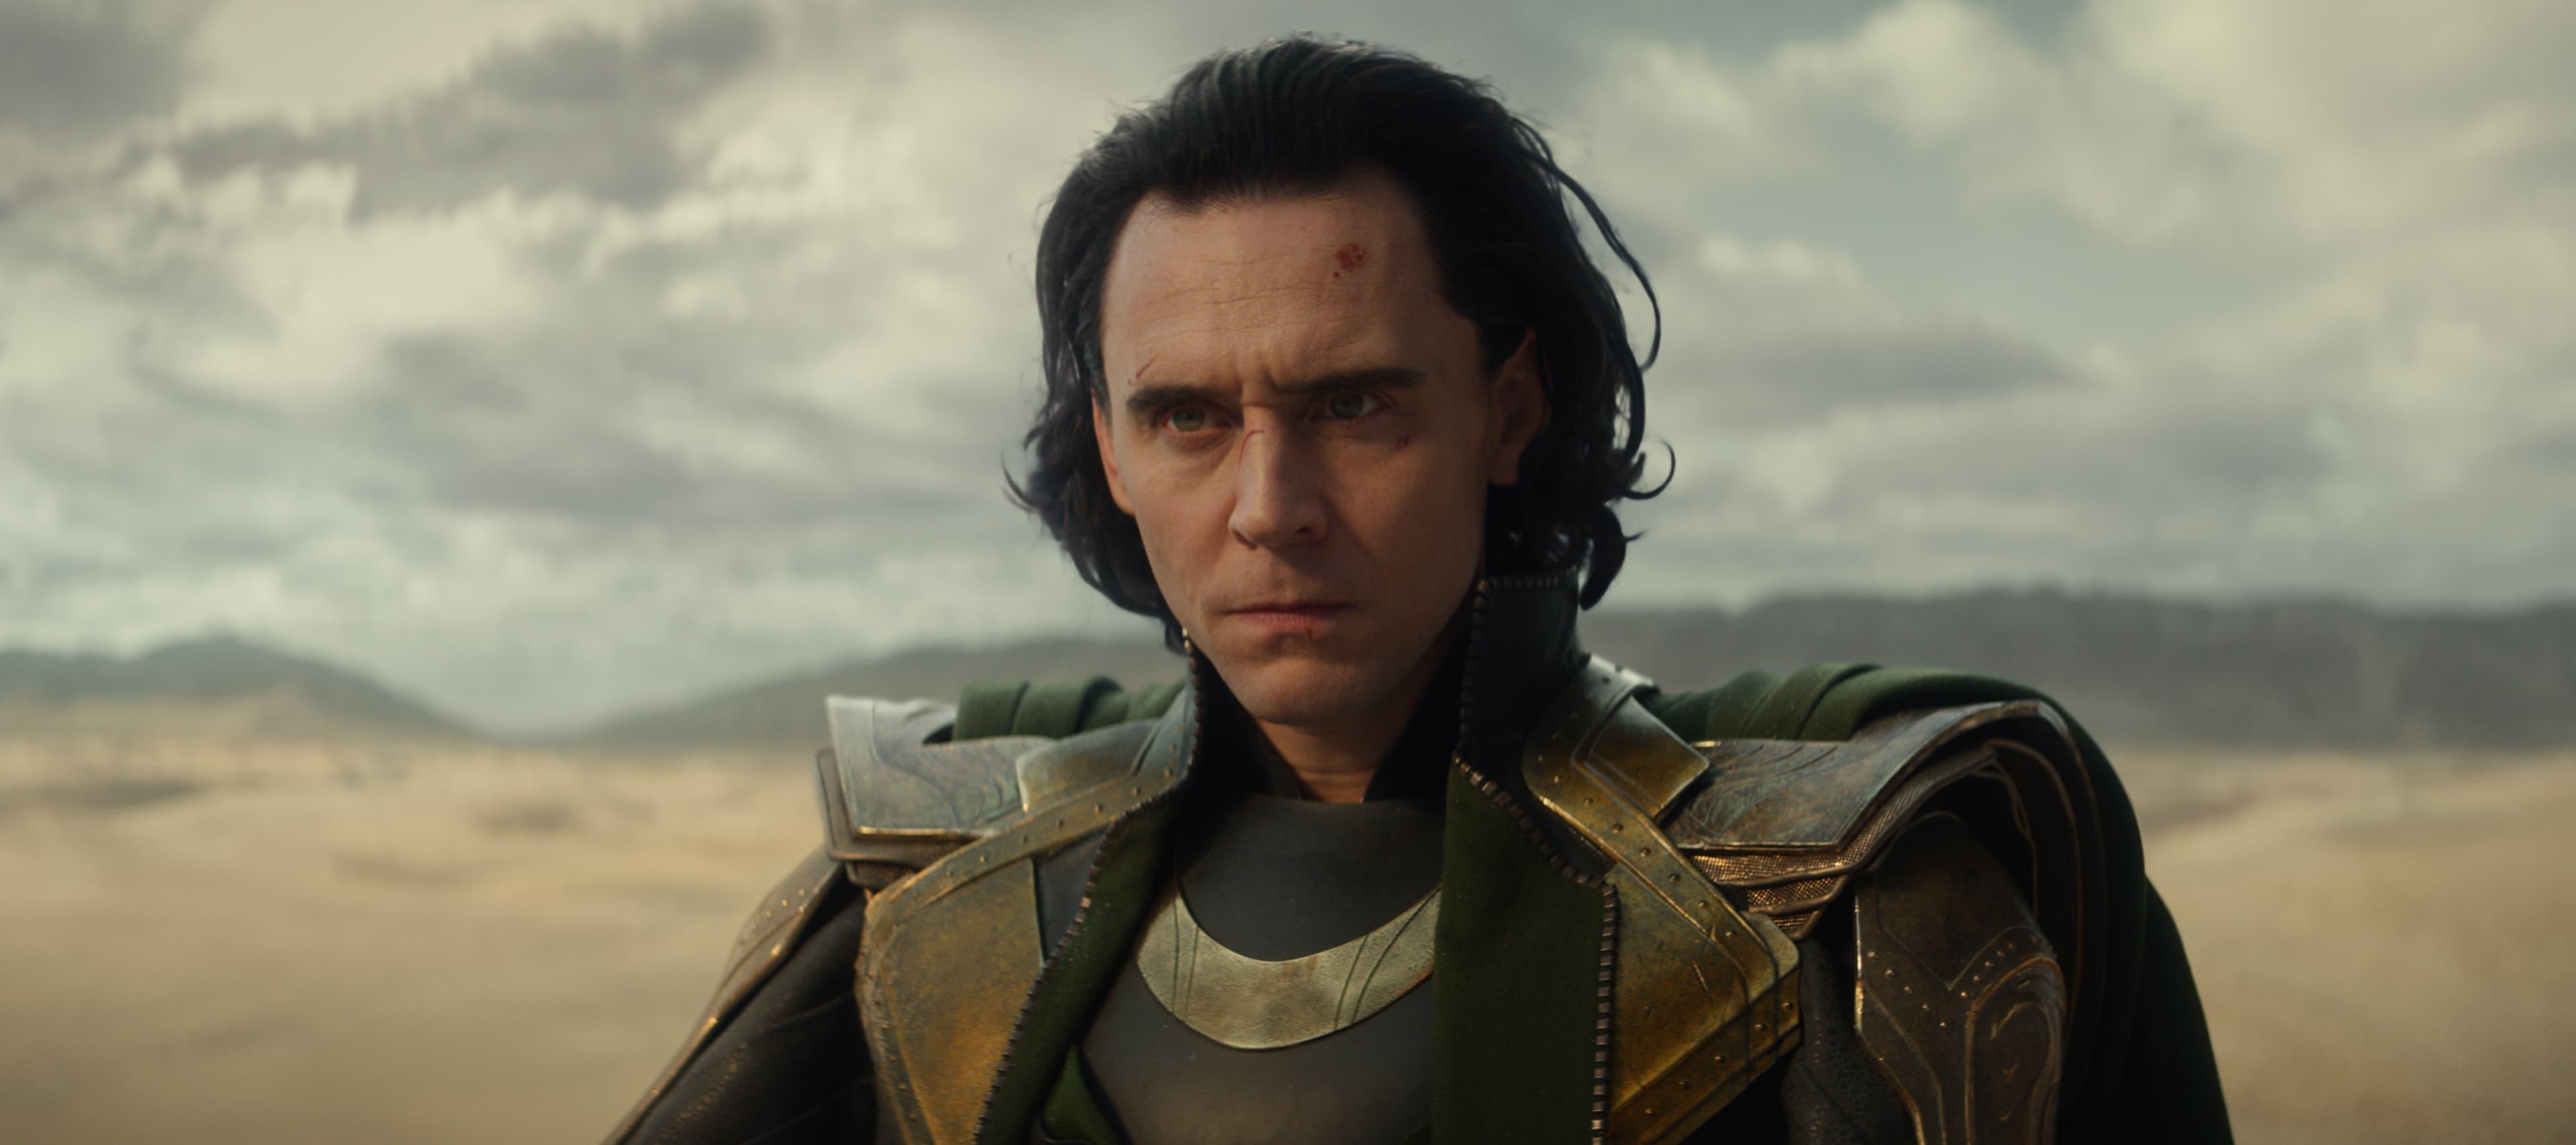 'Loki' Episode 1